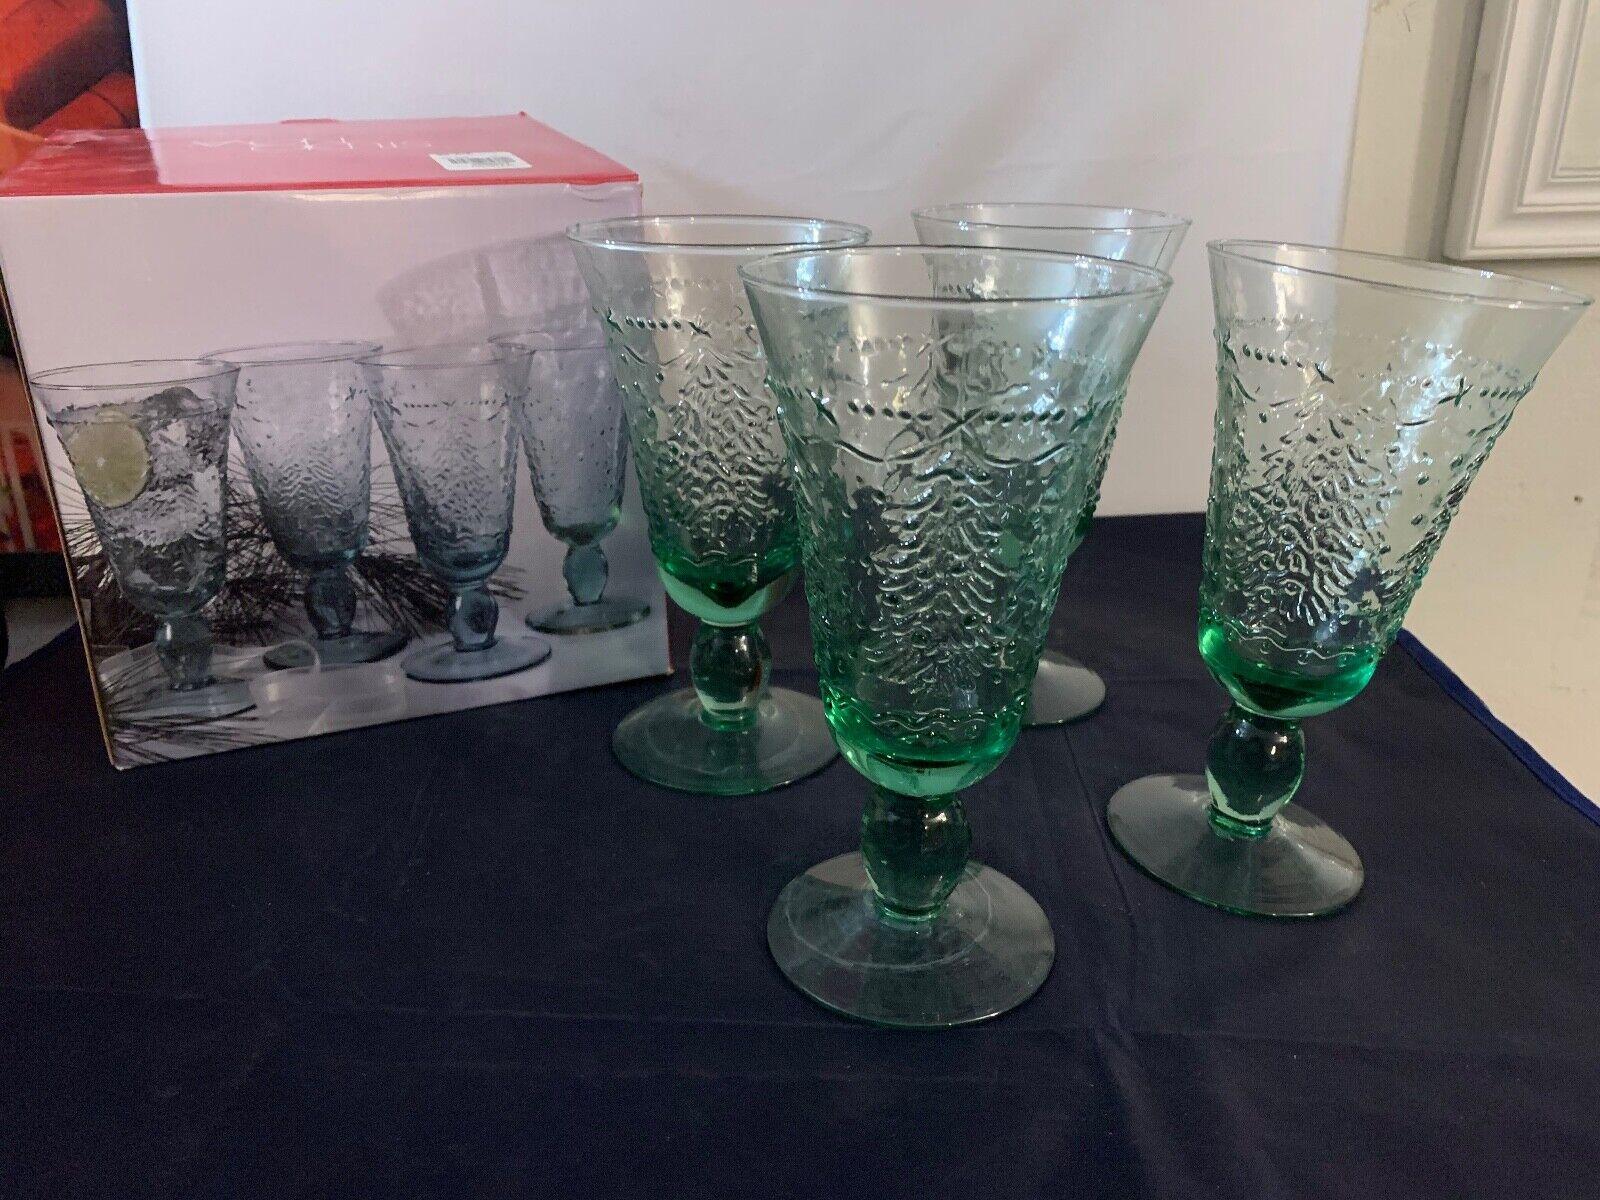 24 Green Christmas Tree Glasses Water Goblets STUDIO NOVA Holiday Cheer 7 TAL - $79.99